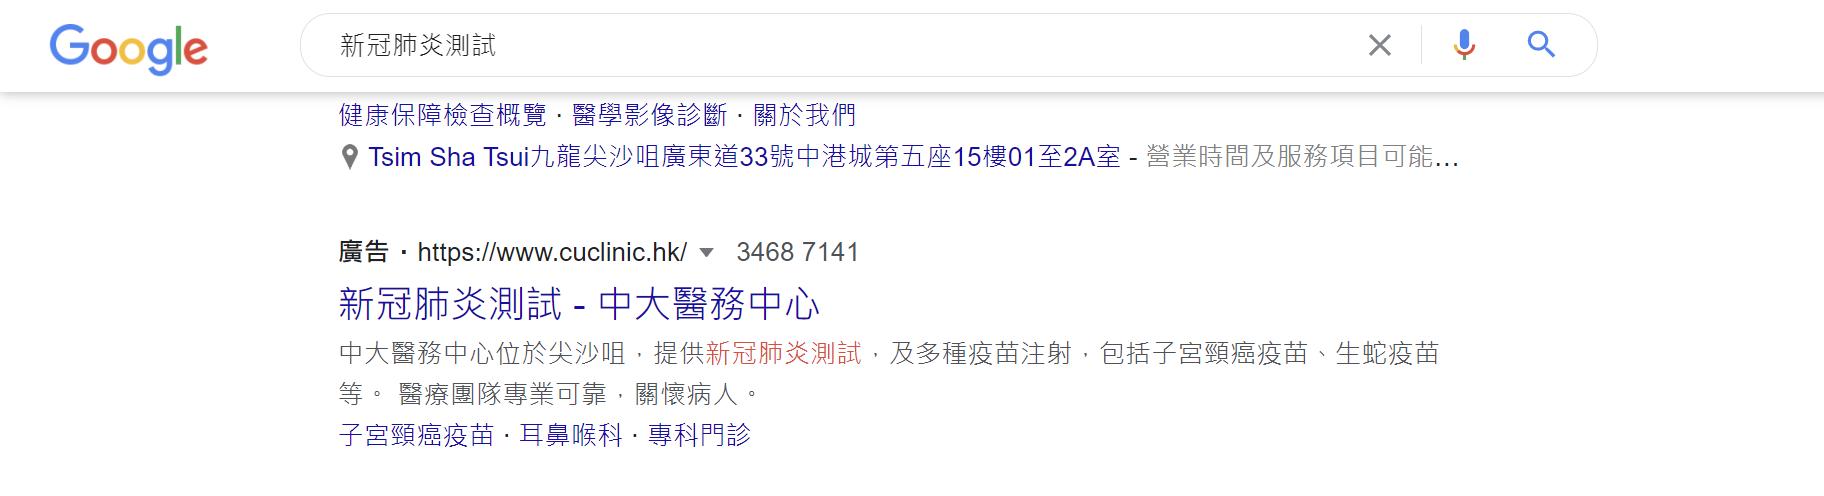 CUHKclinic新冠肺炎測試.png